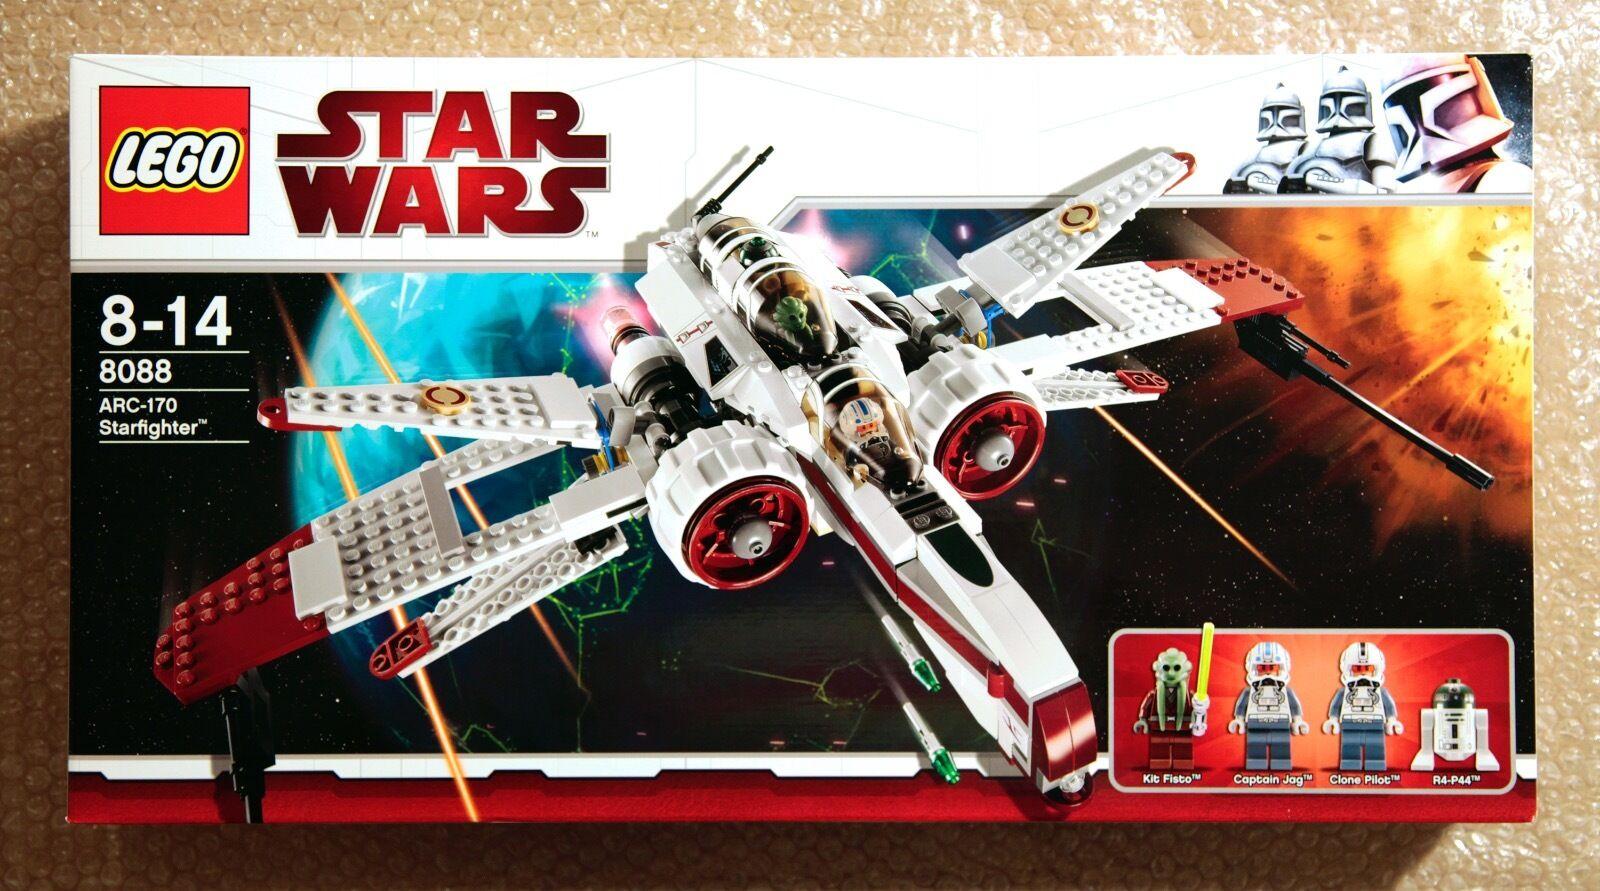 LEGO STAR WARS COLLECTOR - ARC 170 Fighter - ref 8088 - Boîte neuve scellée MISB